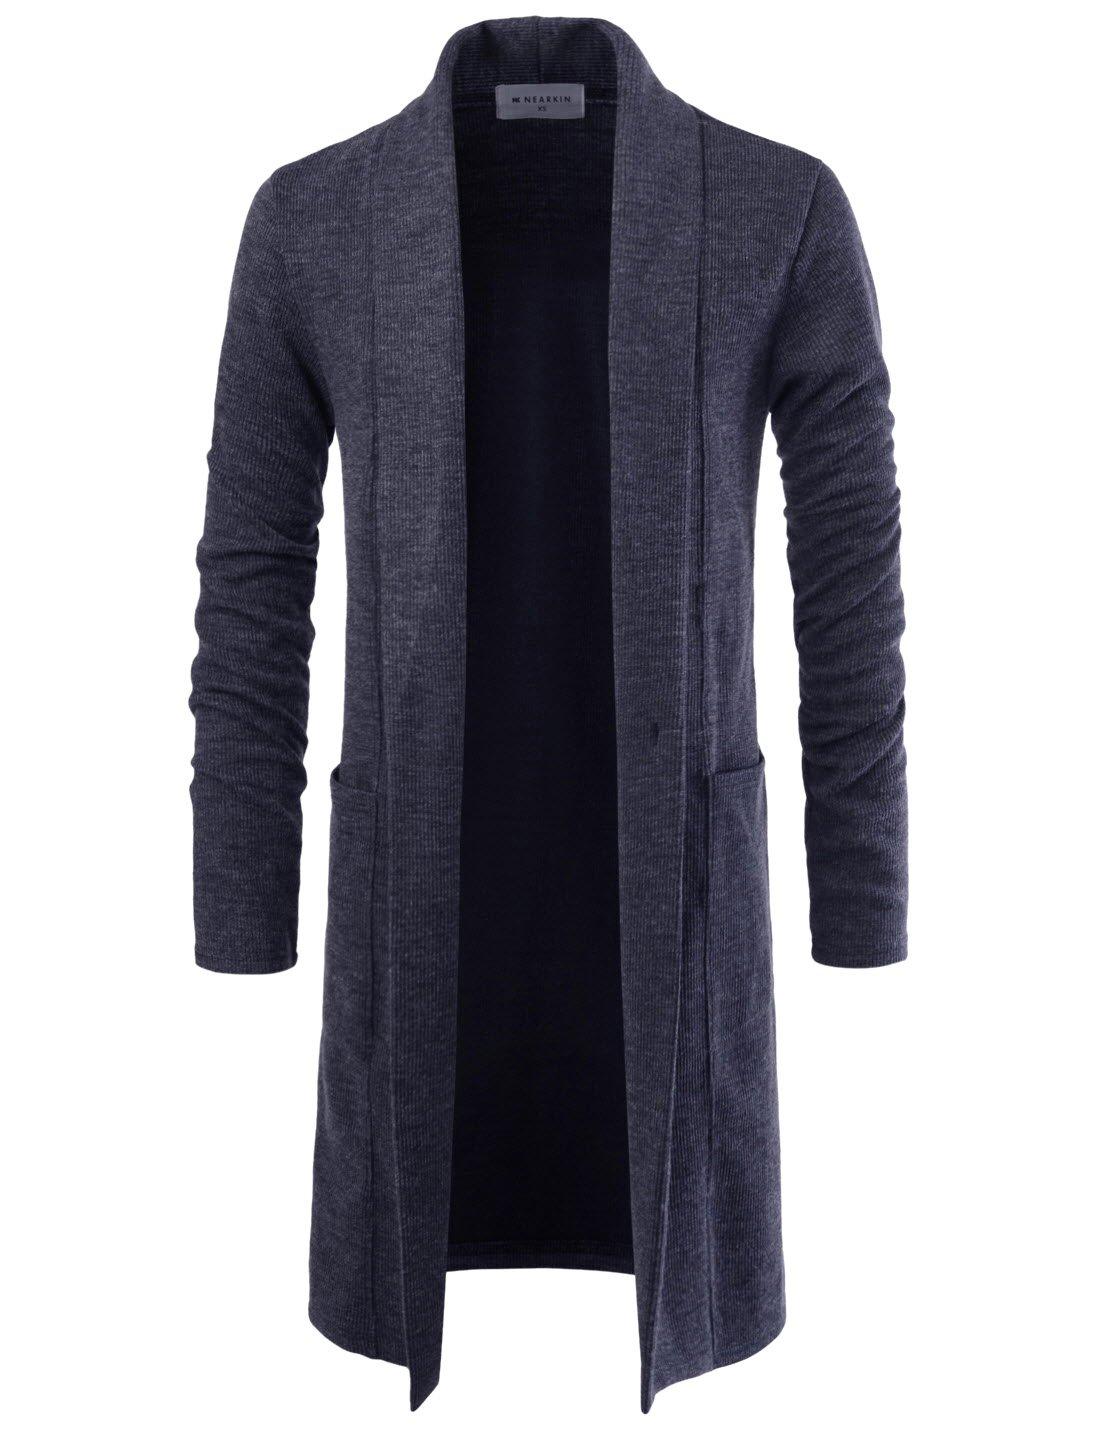 NEARKIN NKNKTNC803 Mens Slim Cut Look Knitwear Shawl Collar Long Cardigan Sweater Charcoal US S(Tag Size S)